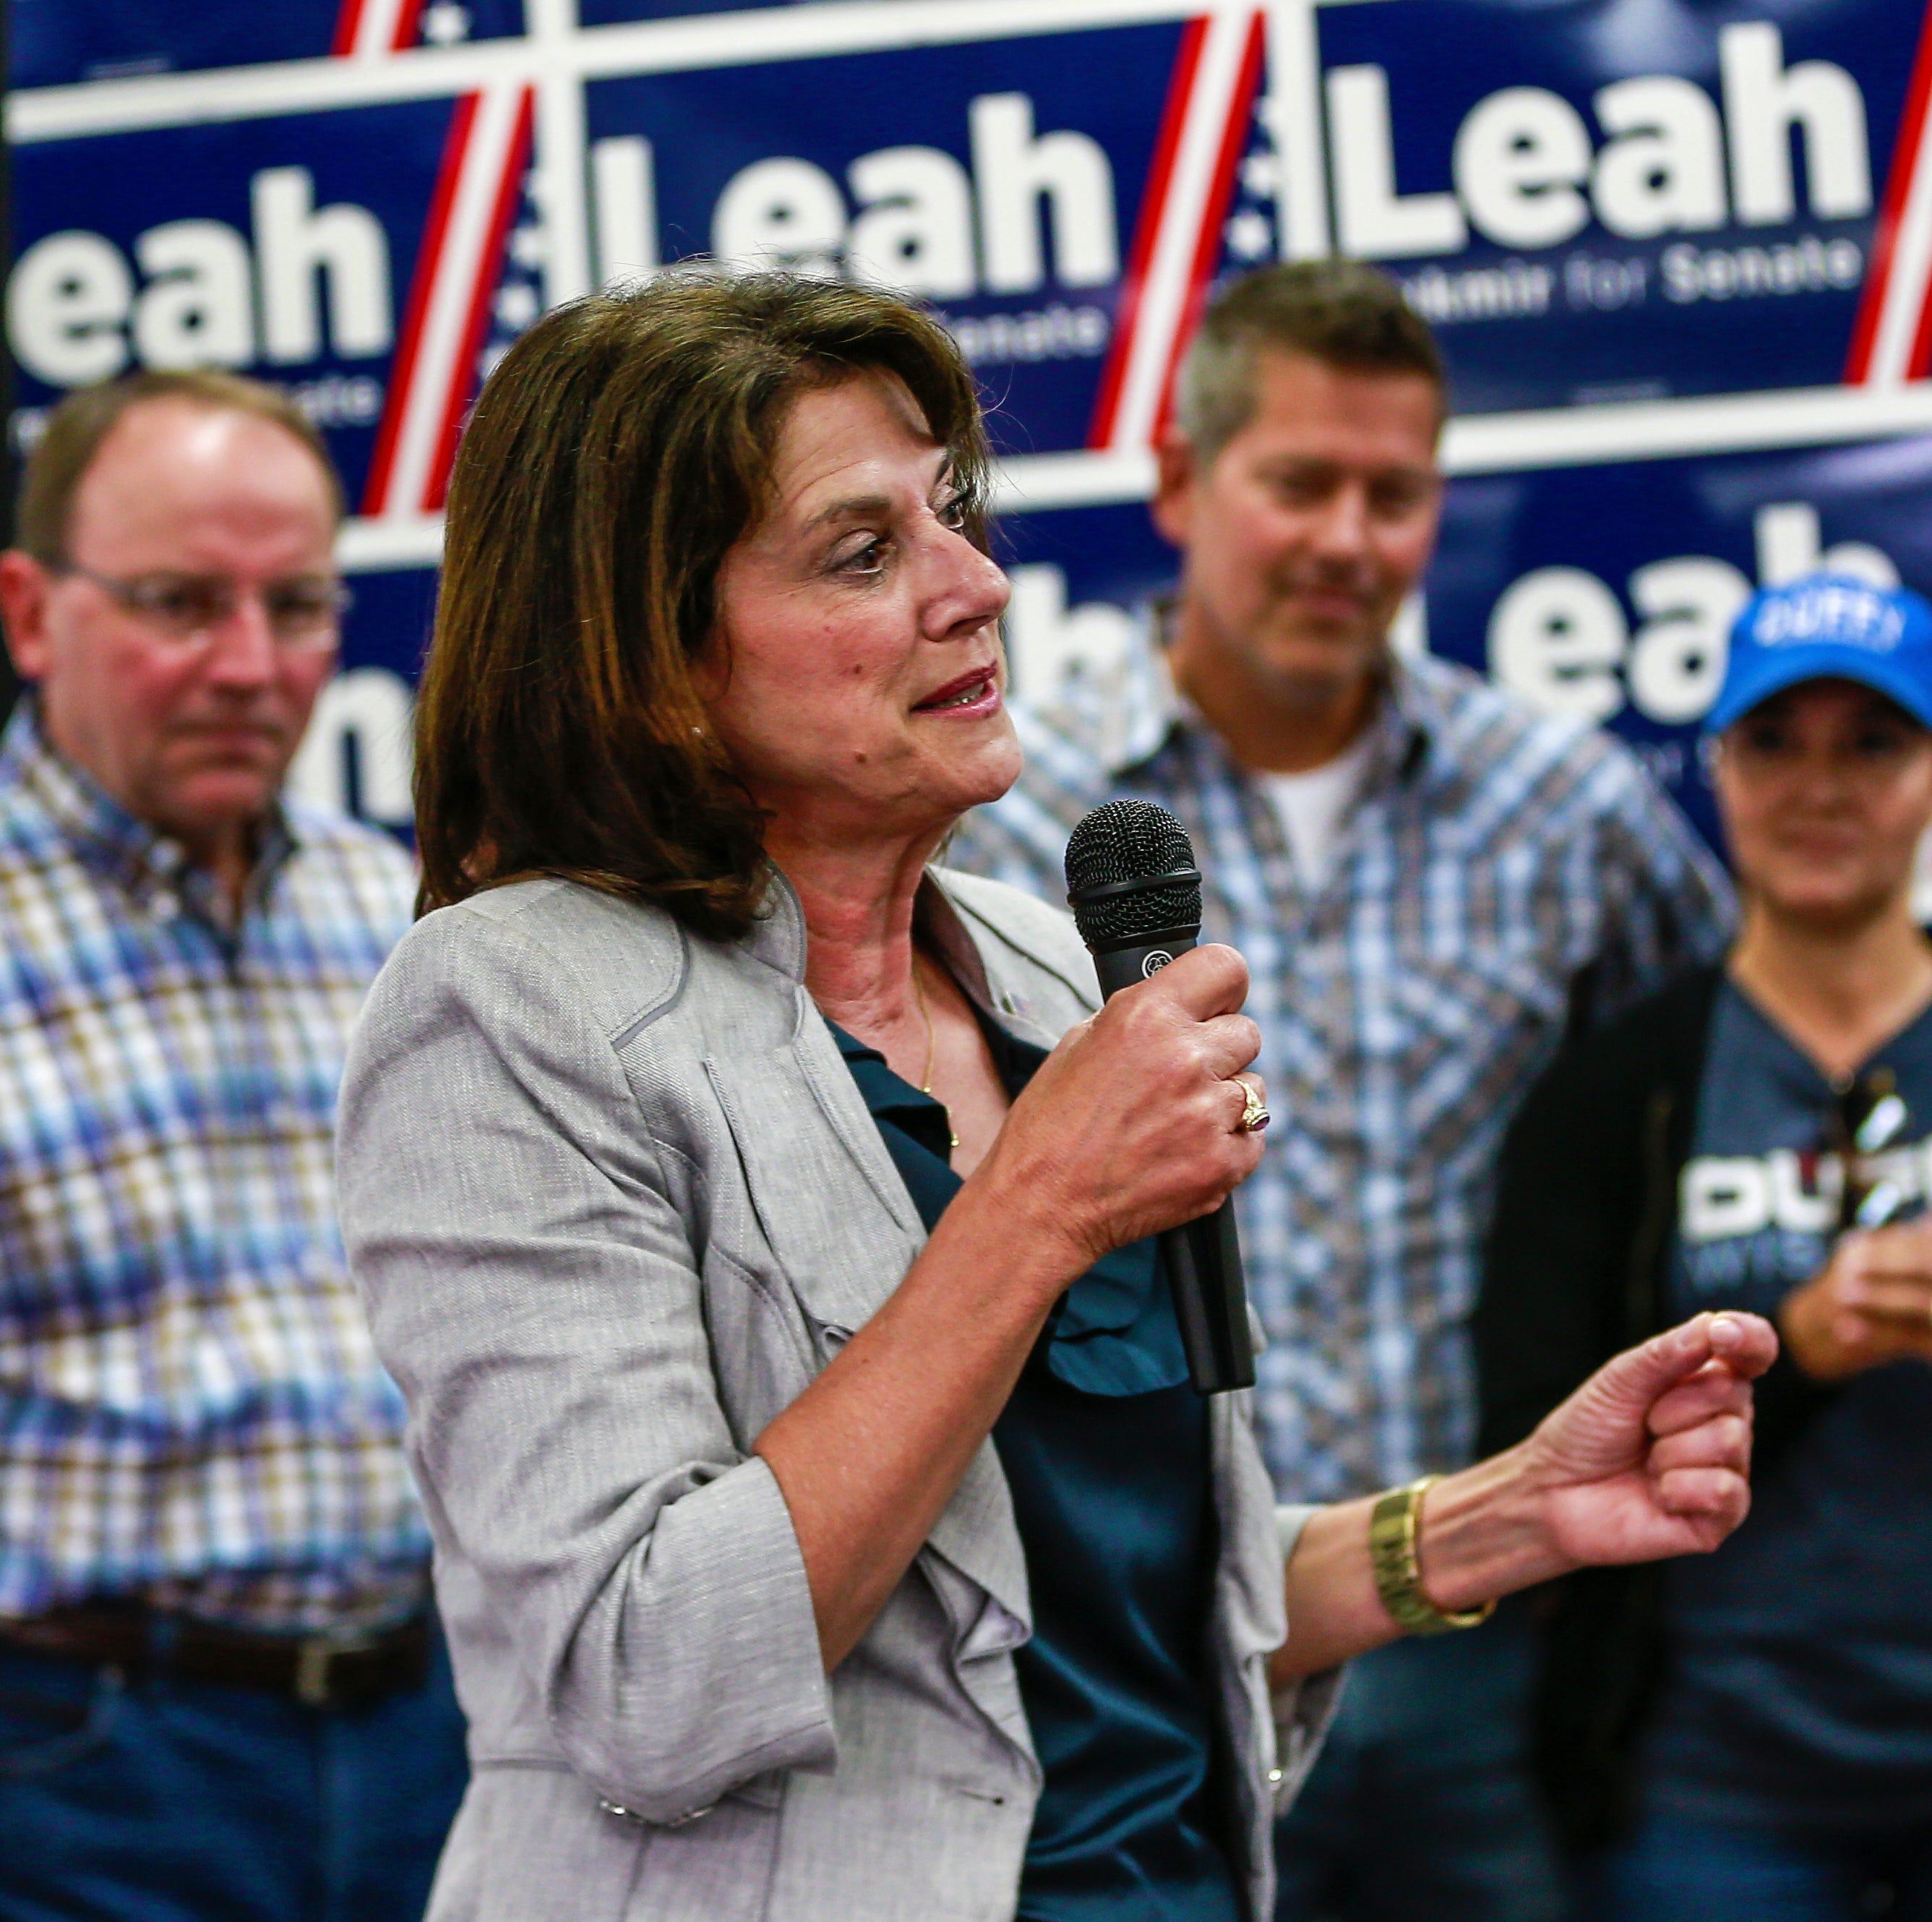 Leah Vukmir finds ally in Sean Duffy as she seeks northern Wisconsin votes in Senate race